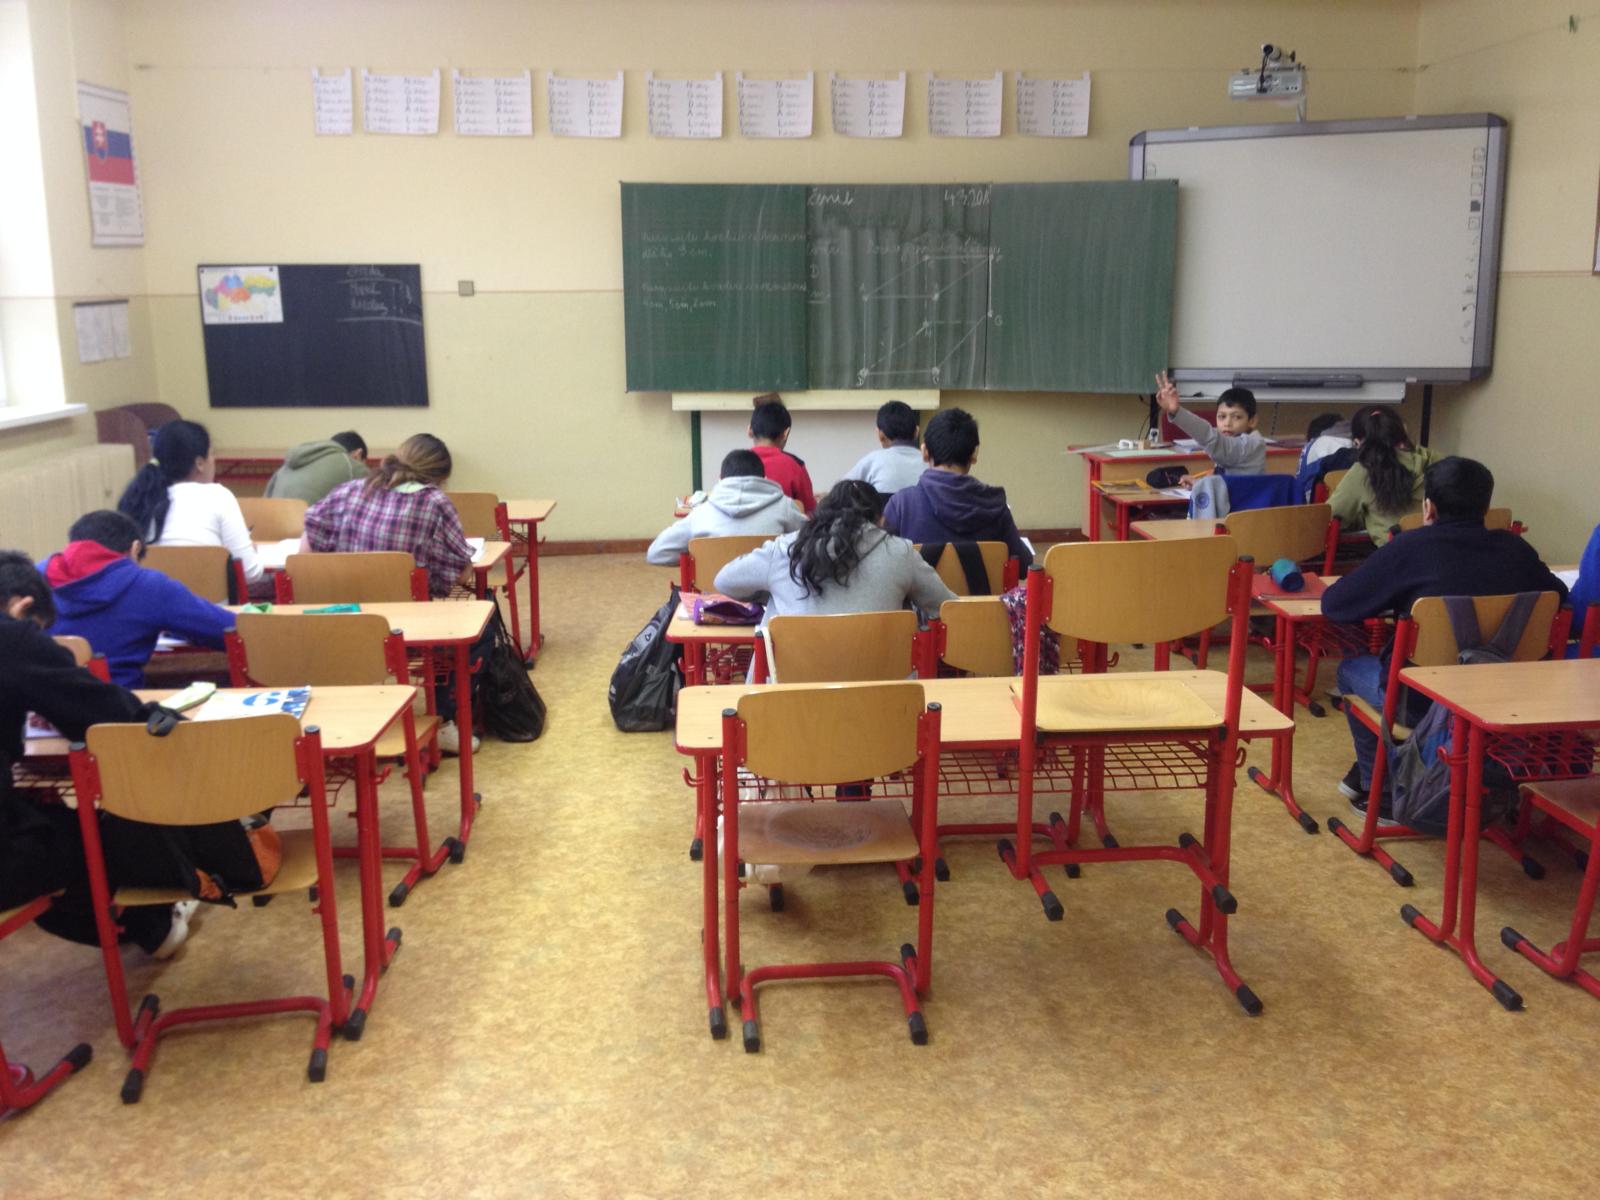 Slovakia: Unlawful ethnic segregation in schools is failing Romani children